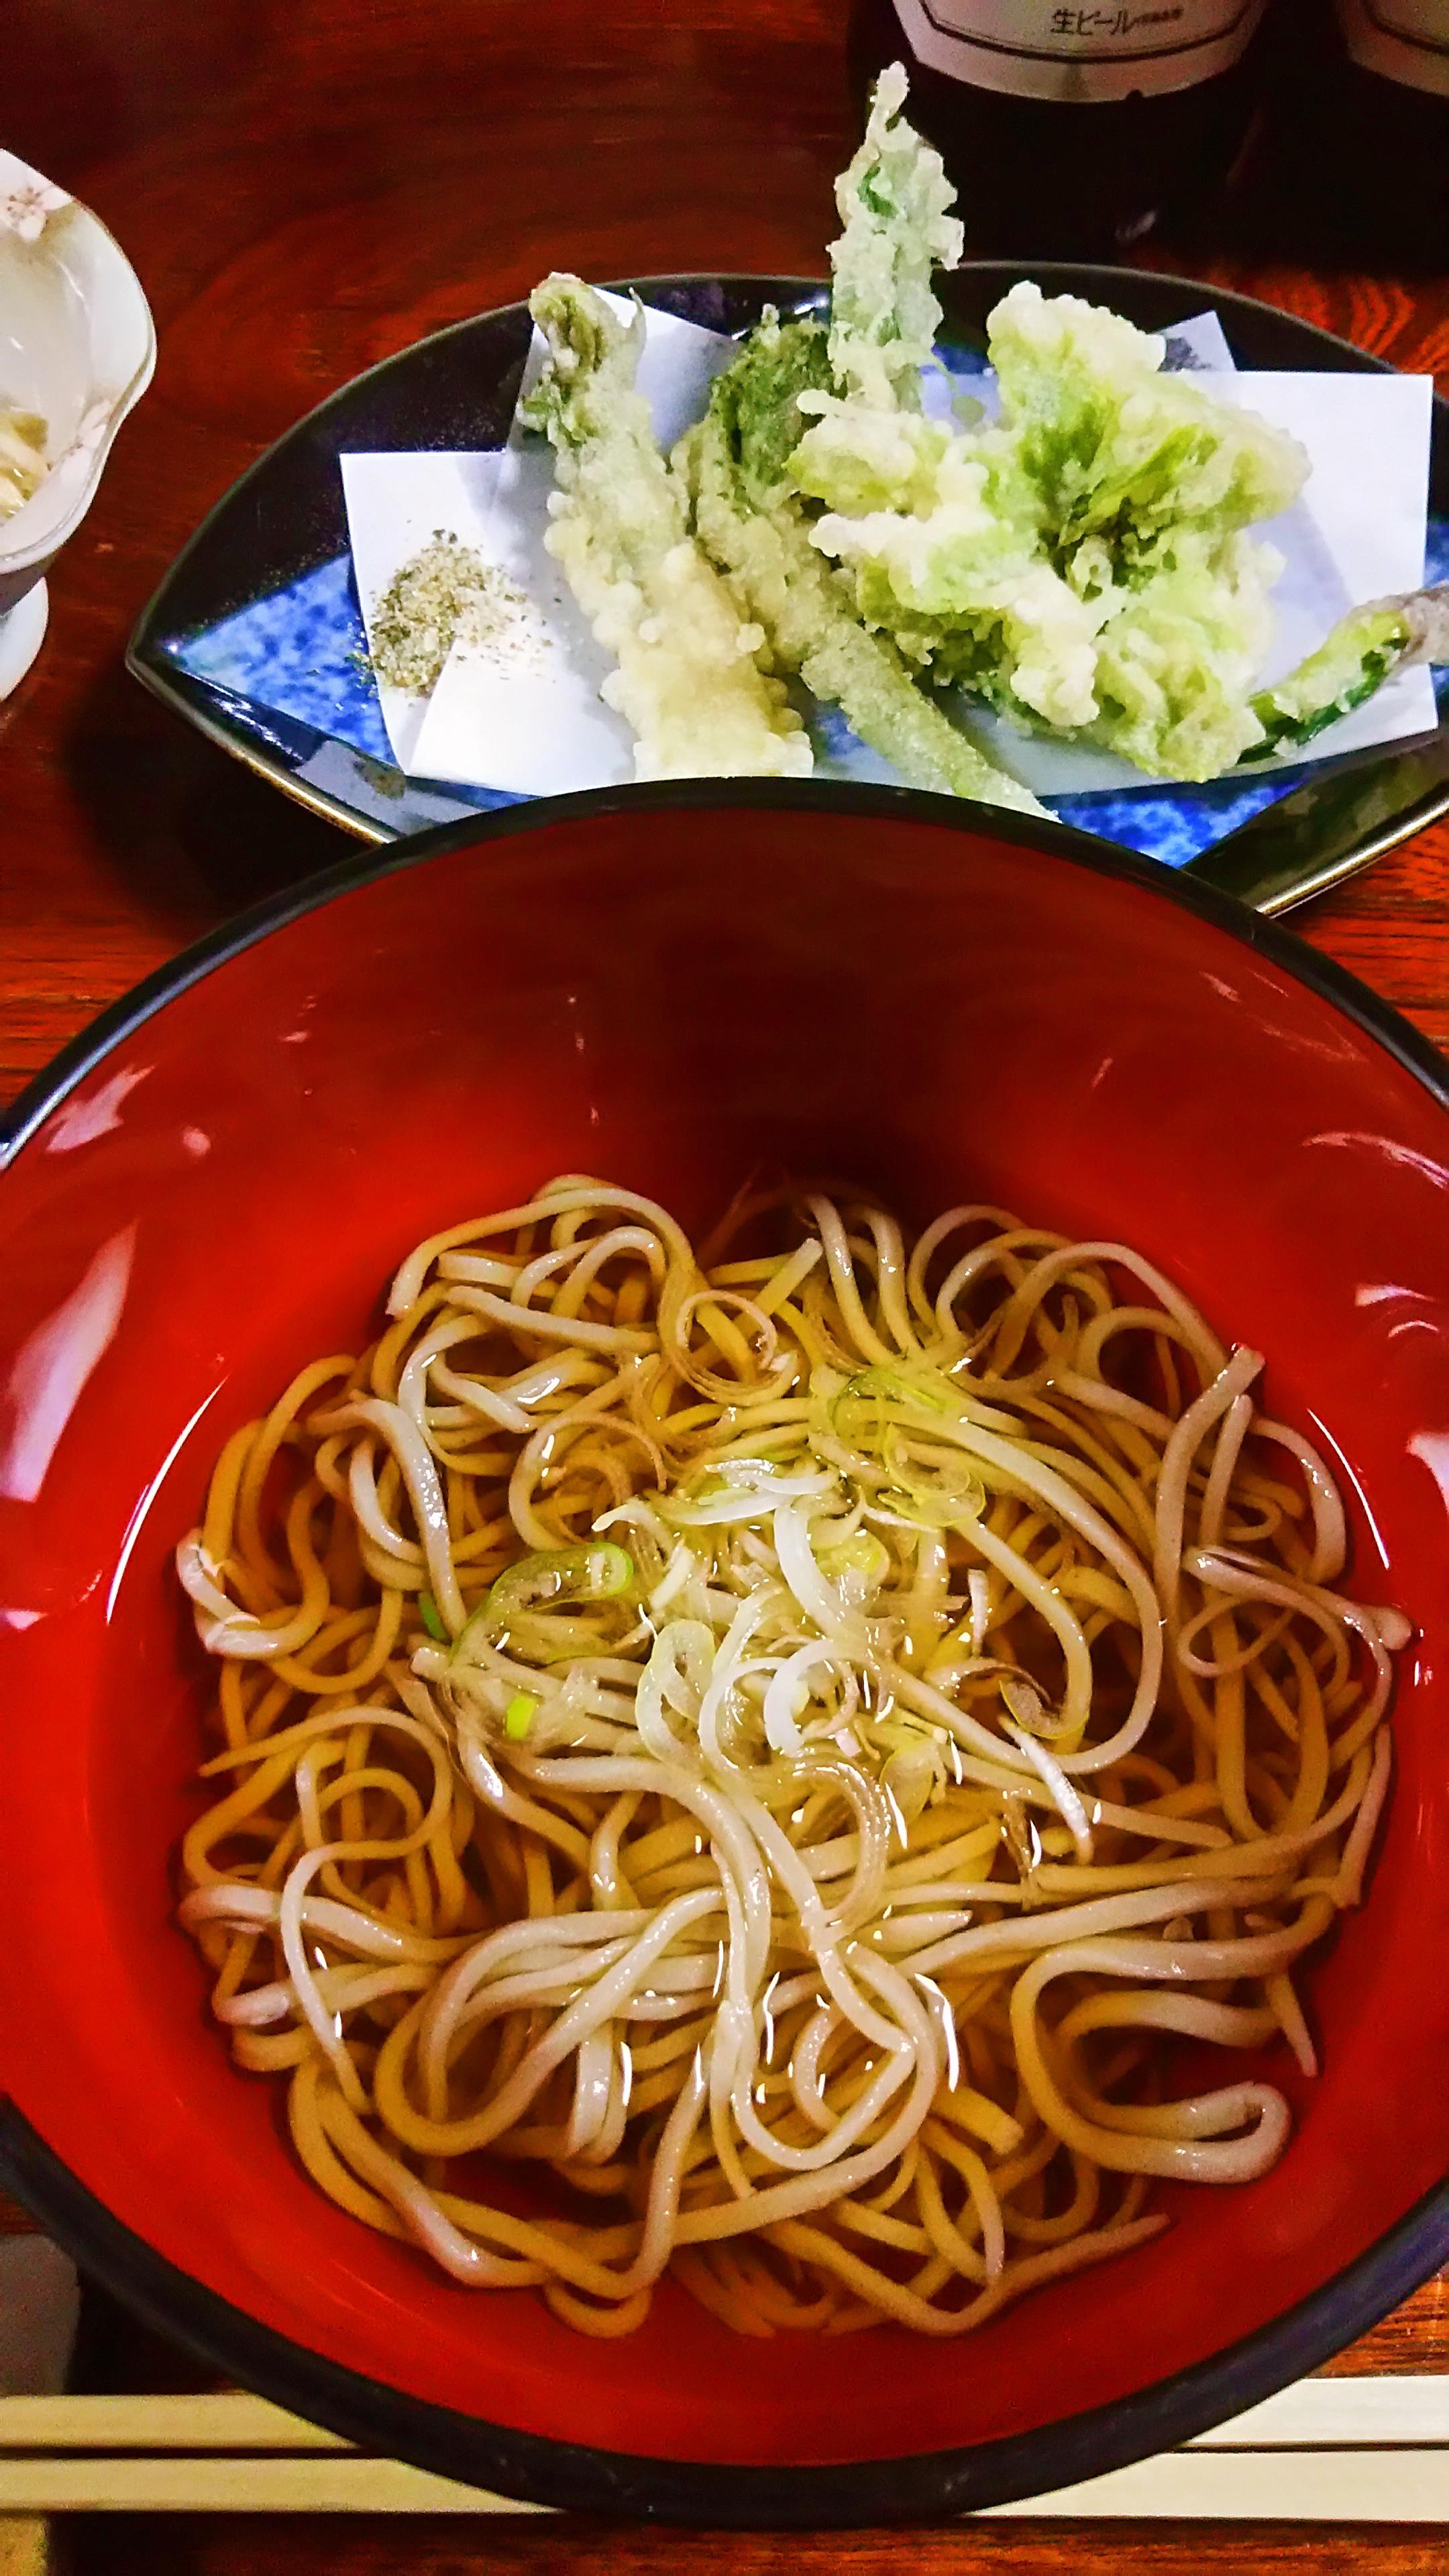 http://www.fukukomachi.com/blog/photo/C360_2017-04-05-19-26-41-198.jpg